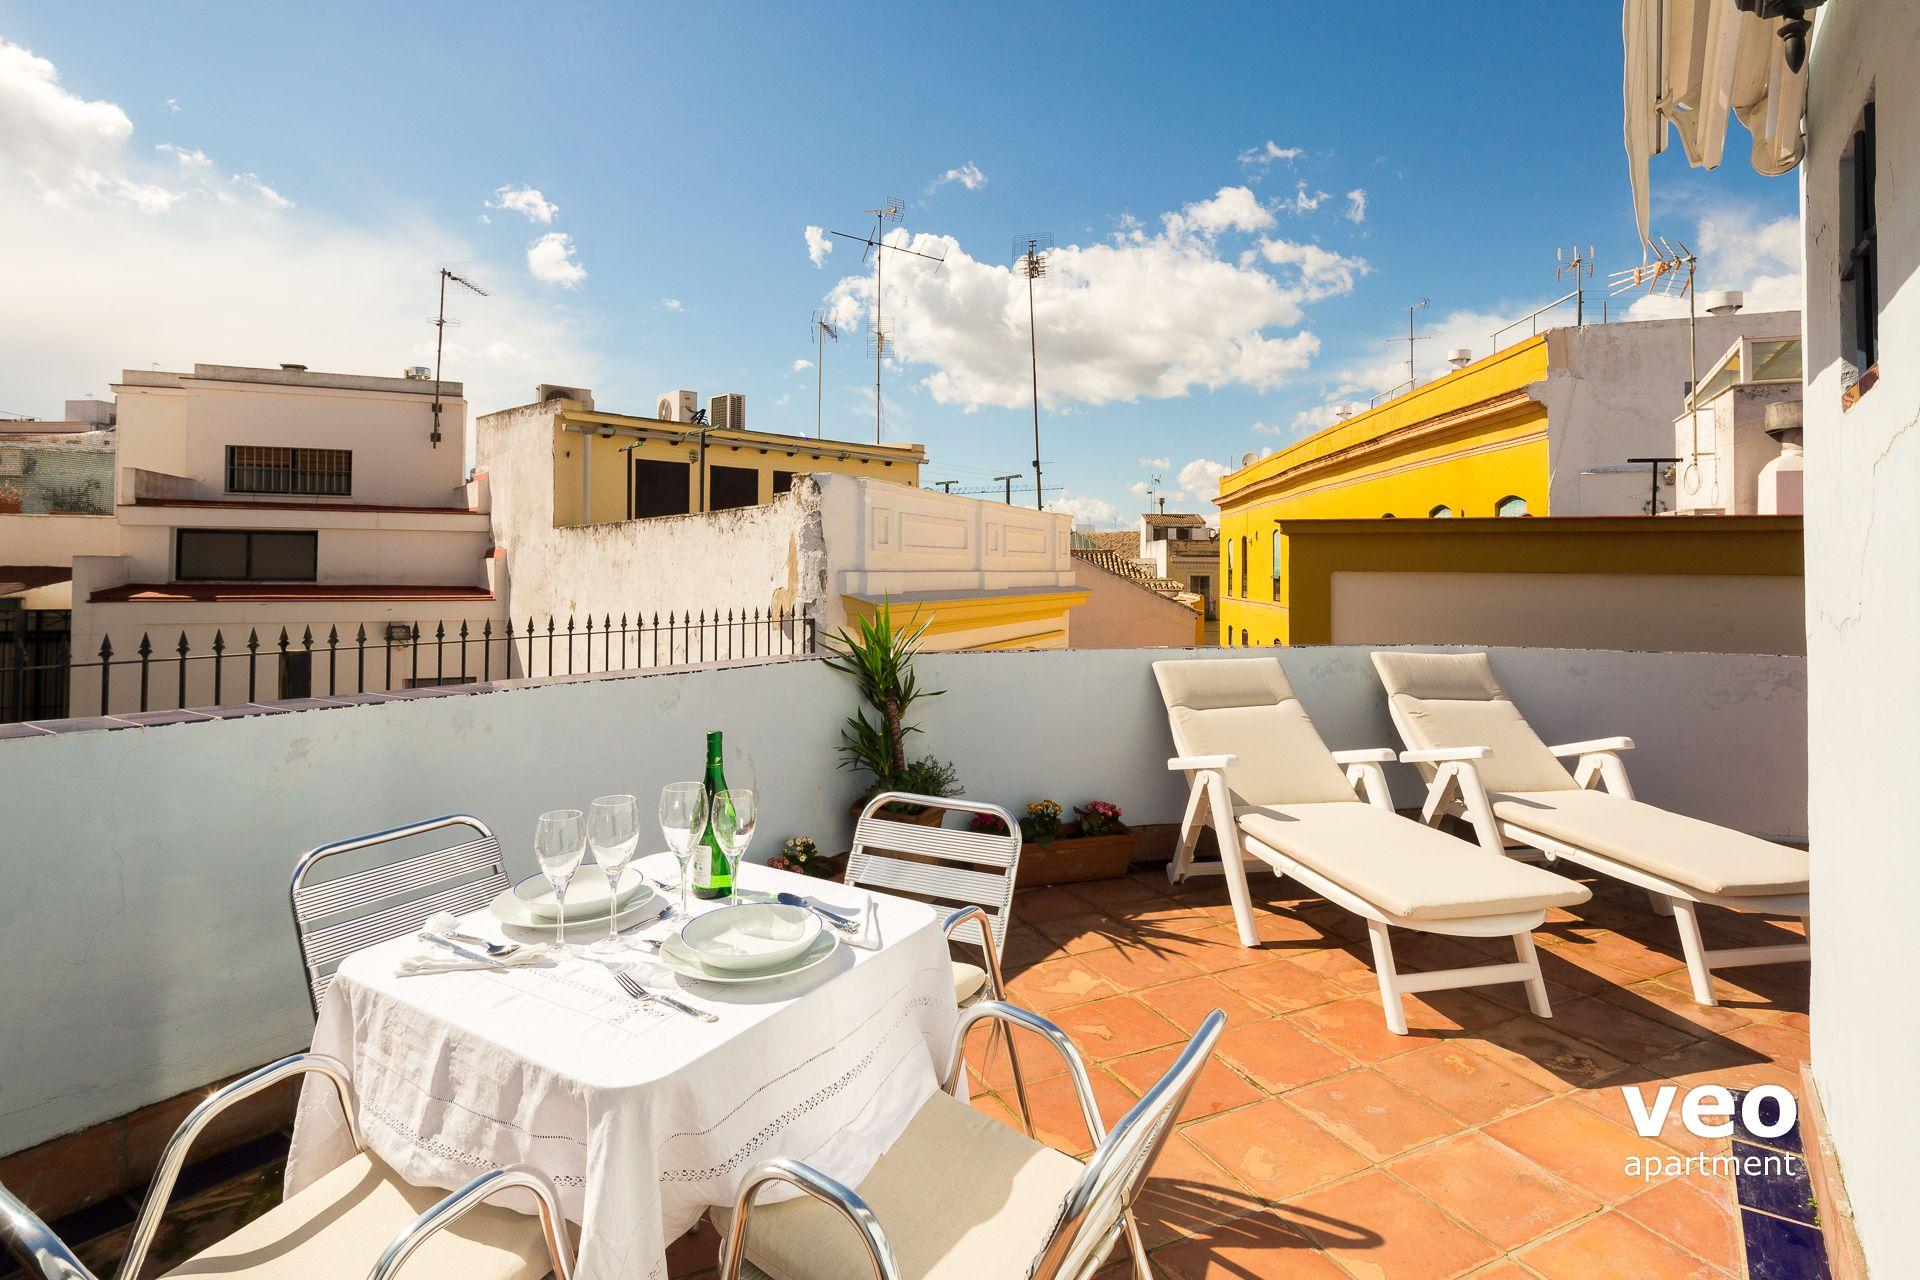 Sevilla apartmento calle san felipe sevilla espa a san - Terraza jardin felipe ...